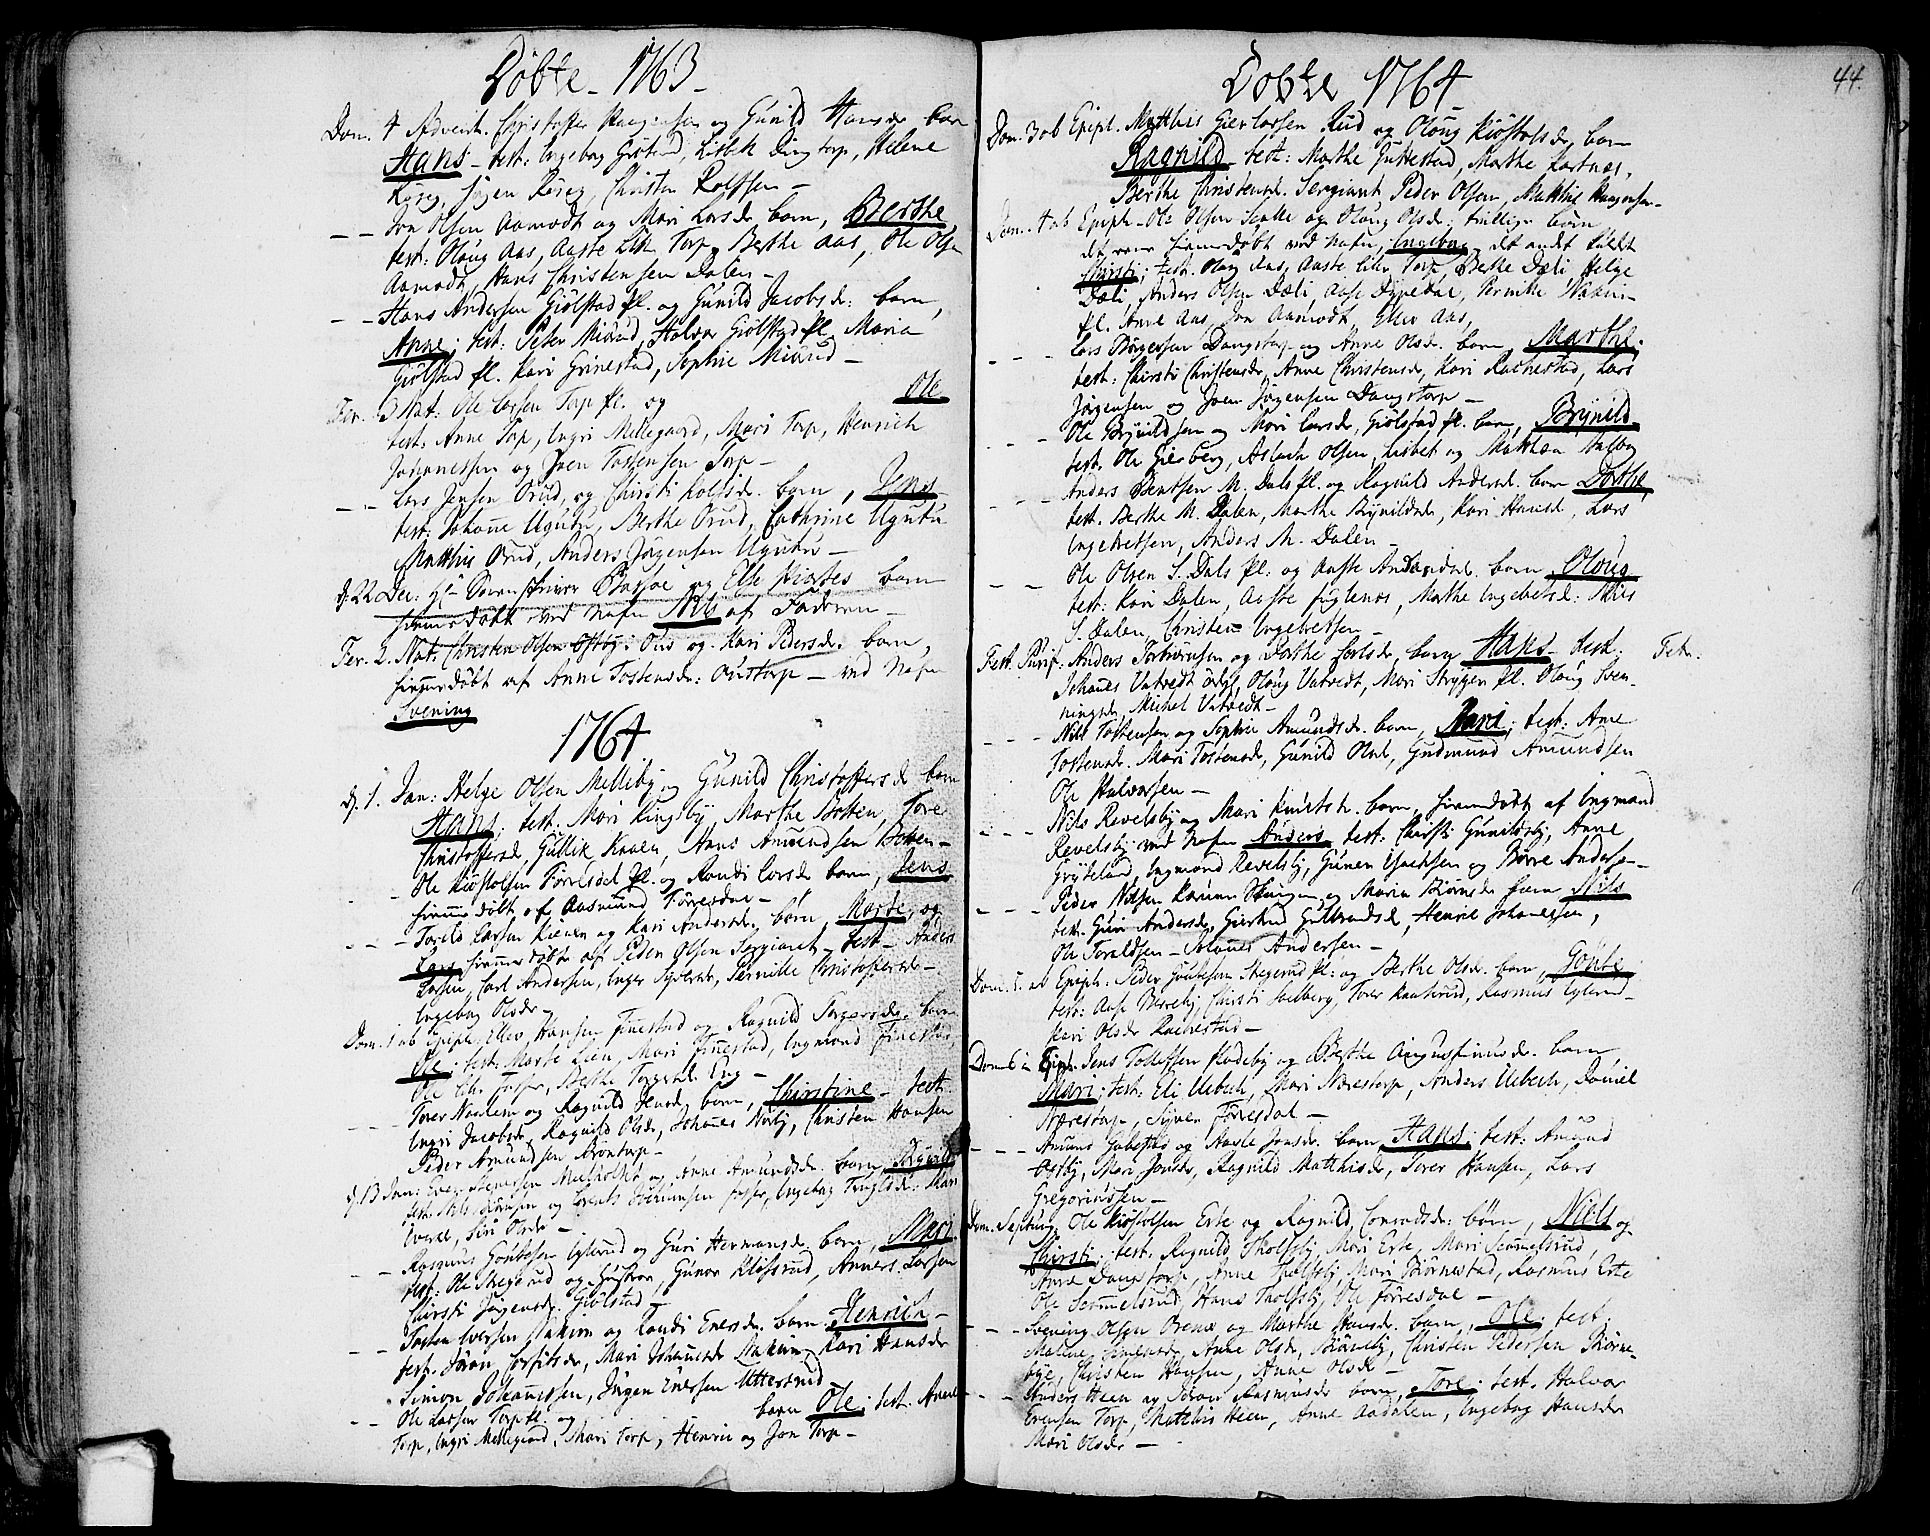 SAO, Rakkestad prestekontor Kirkebøker, F/Fa/L0003: Ministerialbok nr. I 3, 1752-1777, s. 44